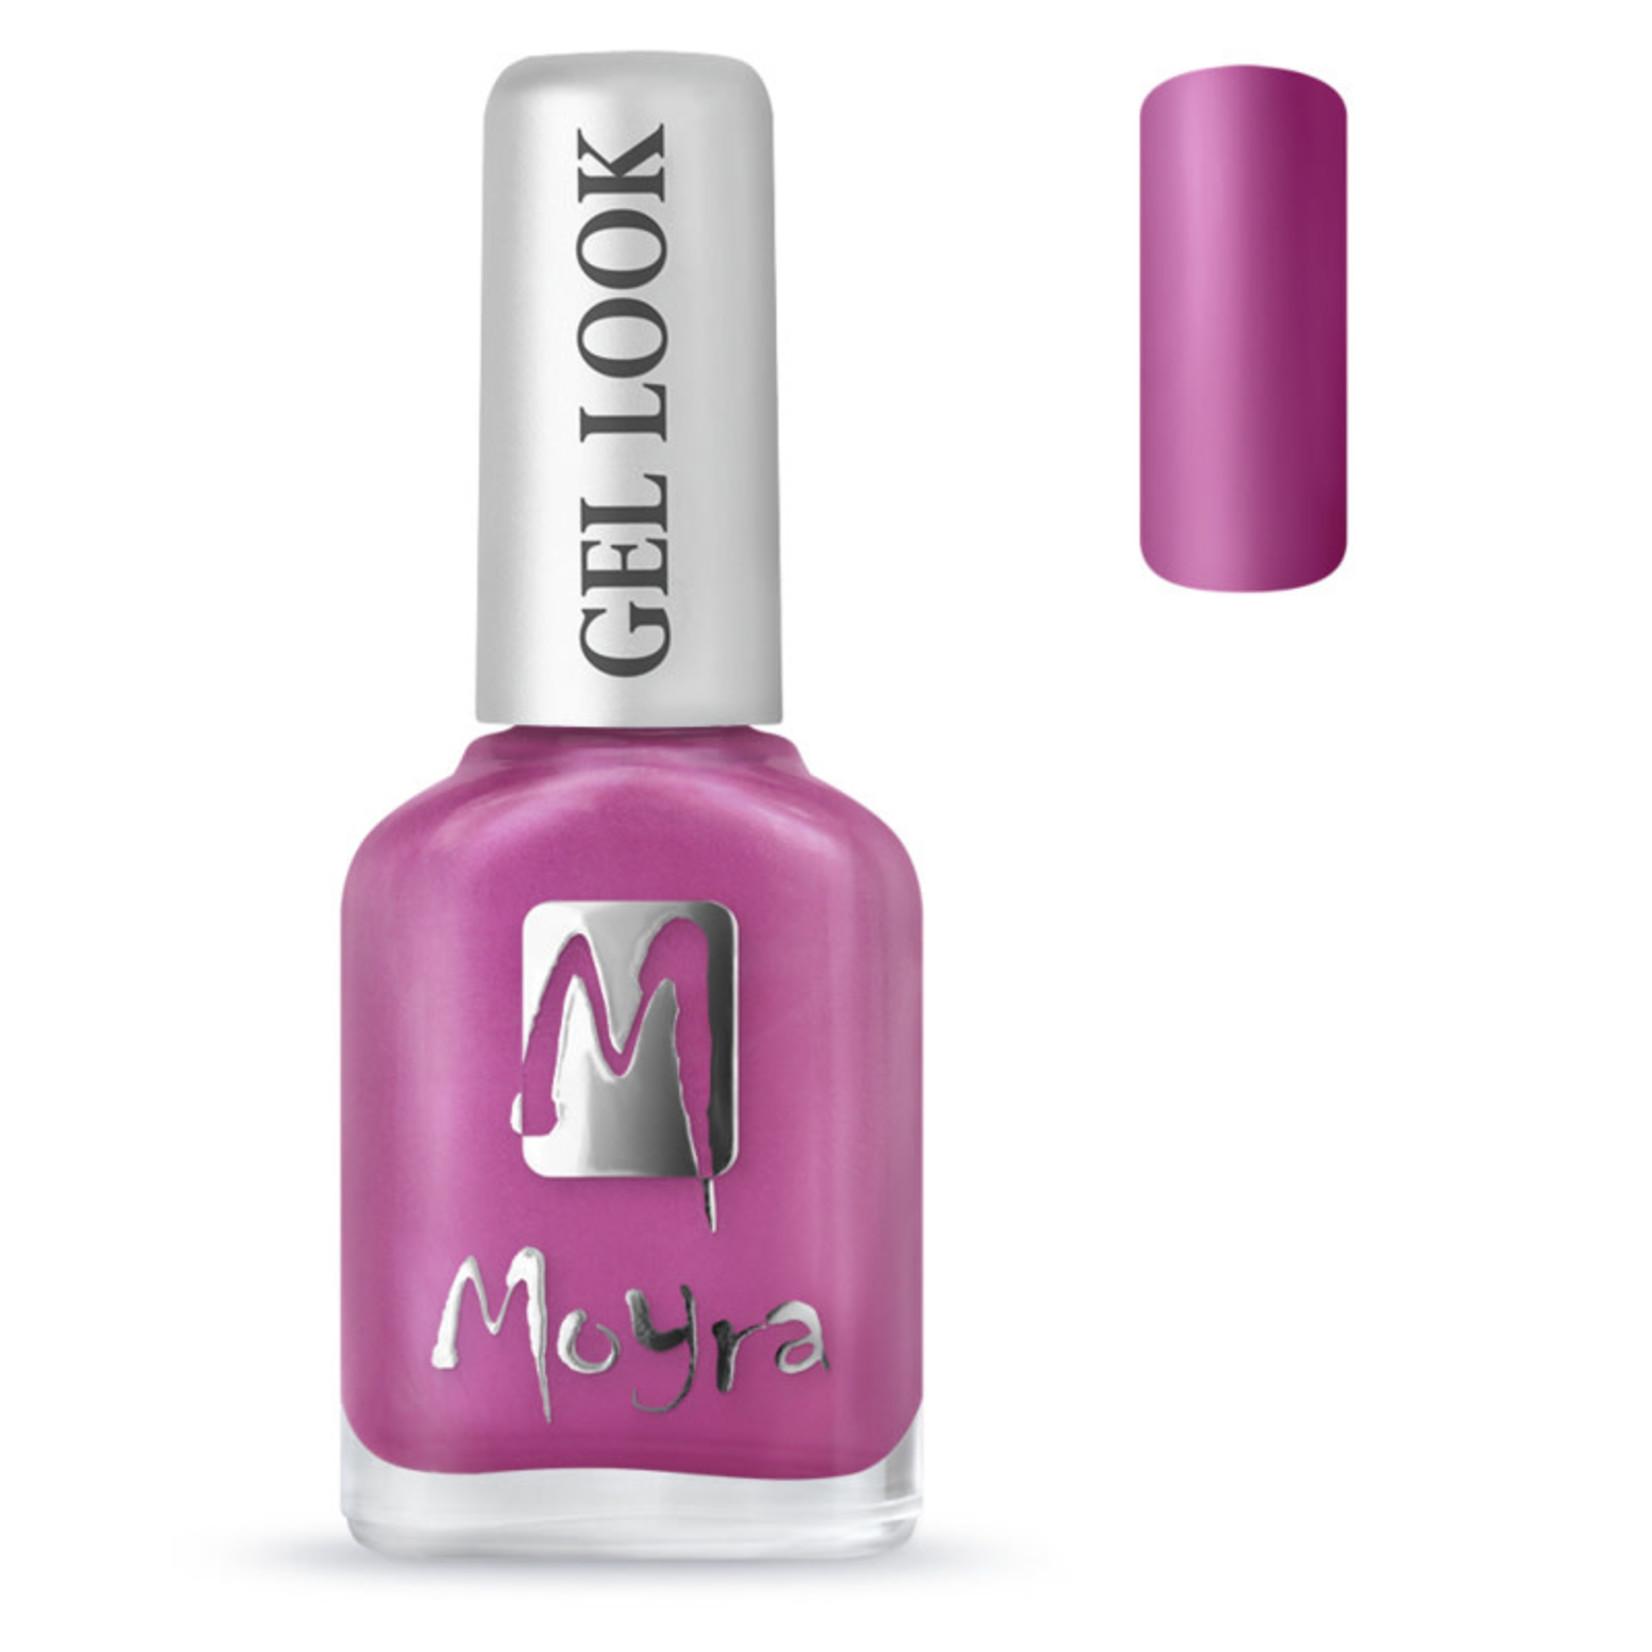 Moyra Moyra Gel Look nail polish 1019 Clemence